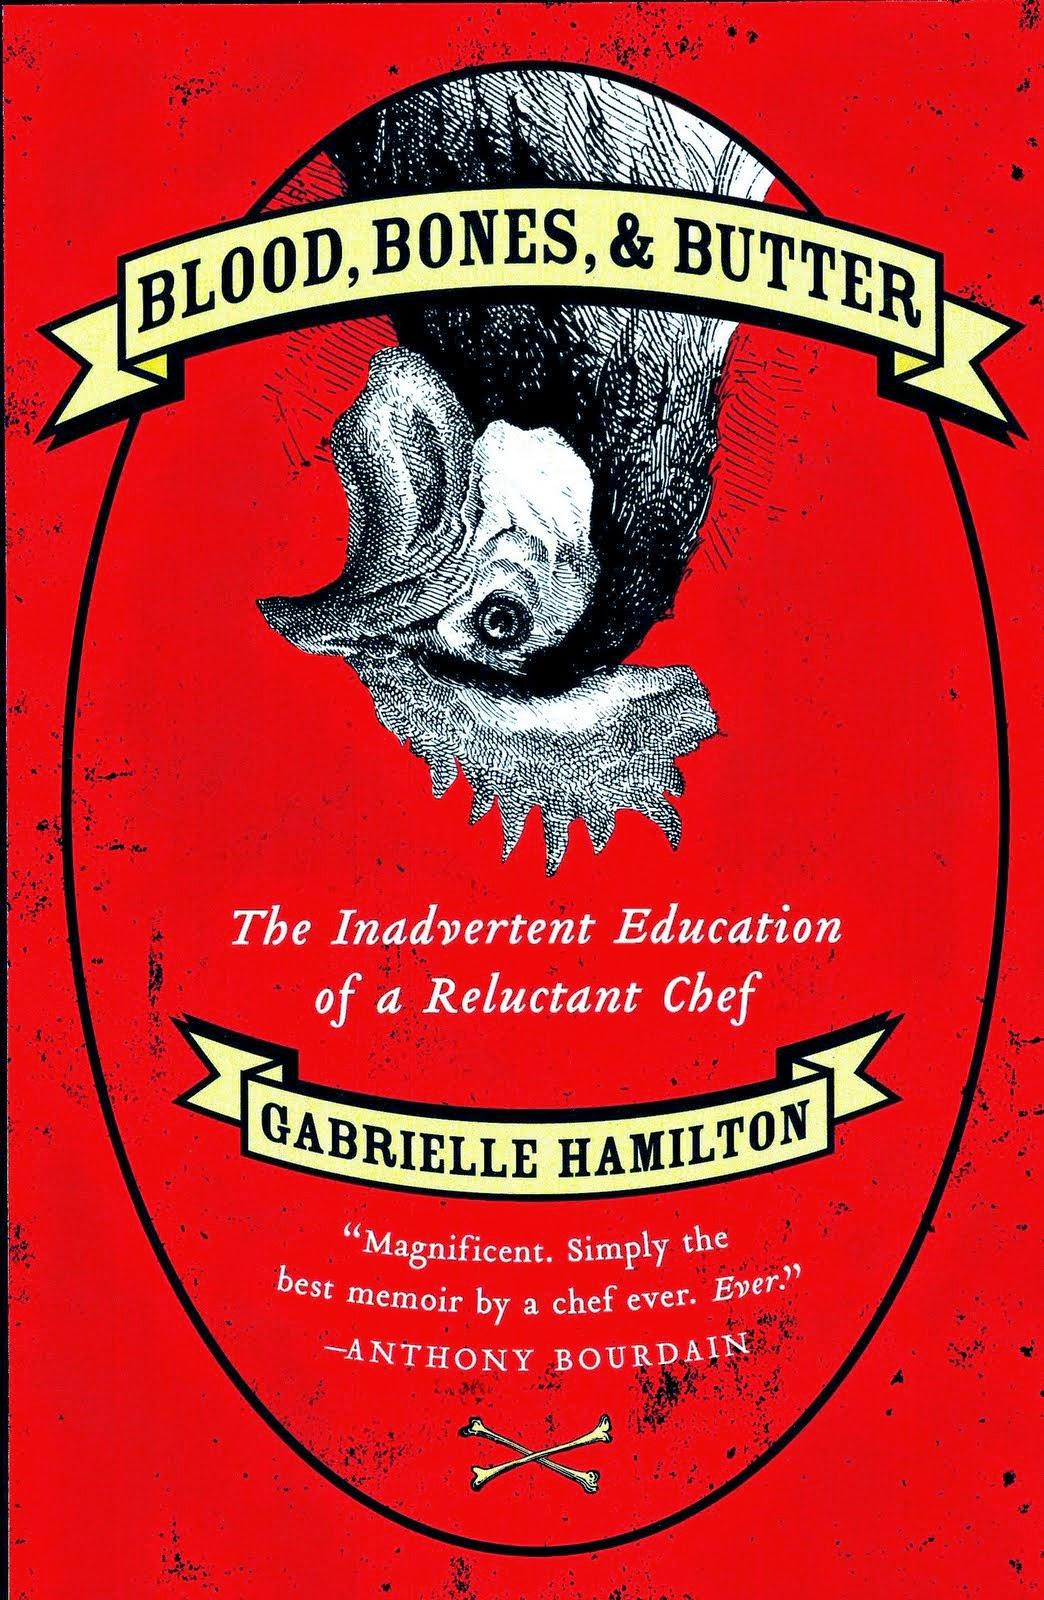 Hamilton, Gabrielle, Blood Bones and Butter 3